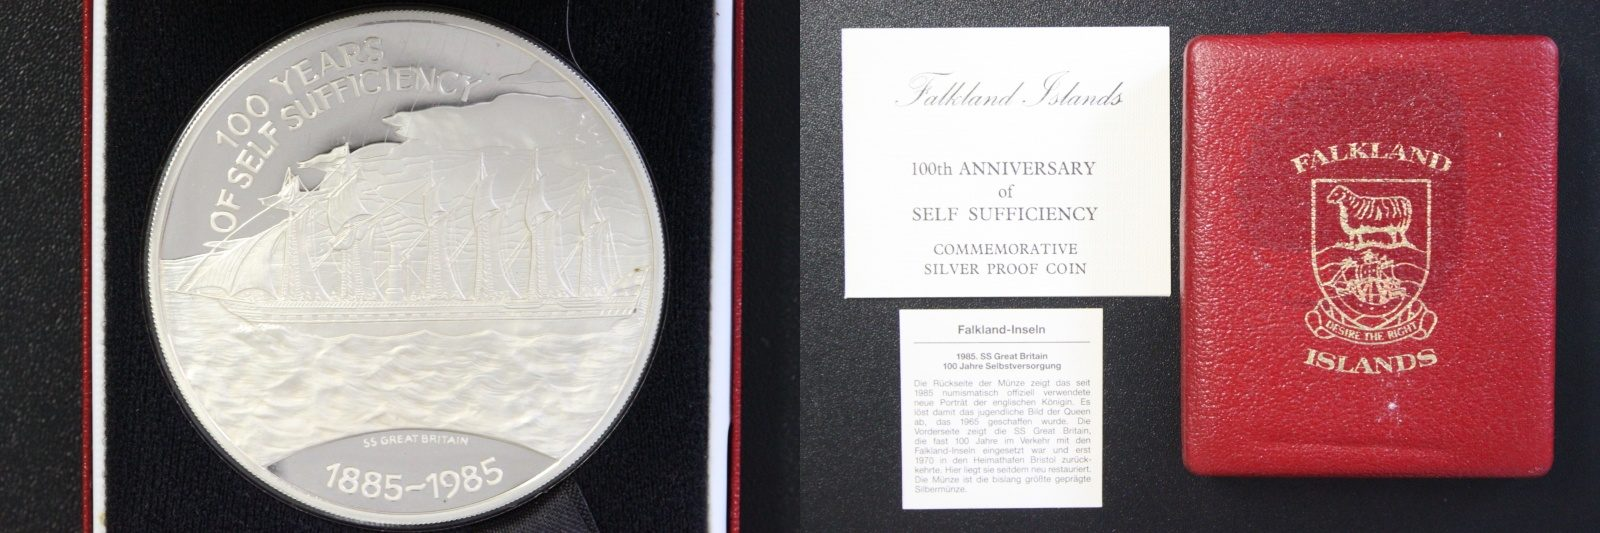 25 Pfund 1985 Falkland Inseln 25 Pounds Falkland Islands 100th Anniversary of Self Sufficiency PP/Etui*/Zert